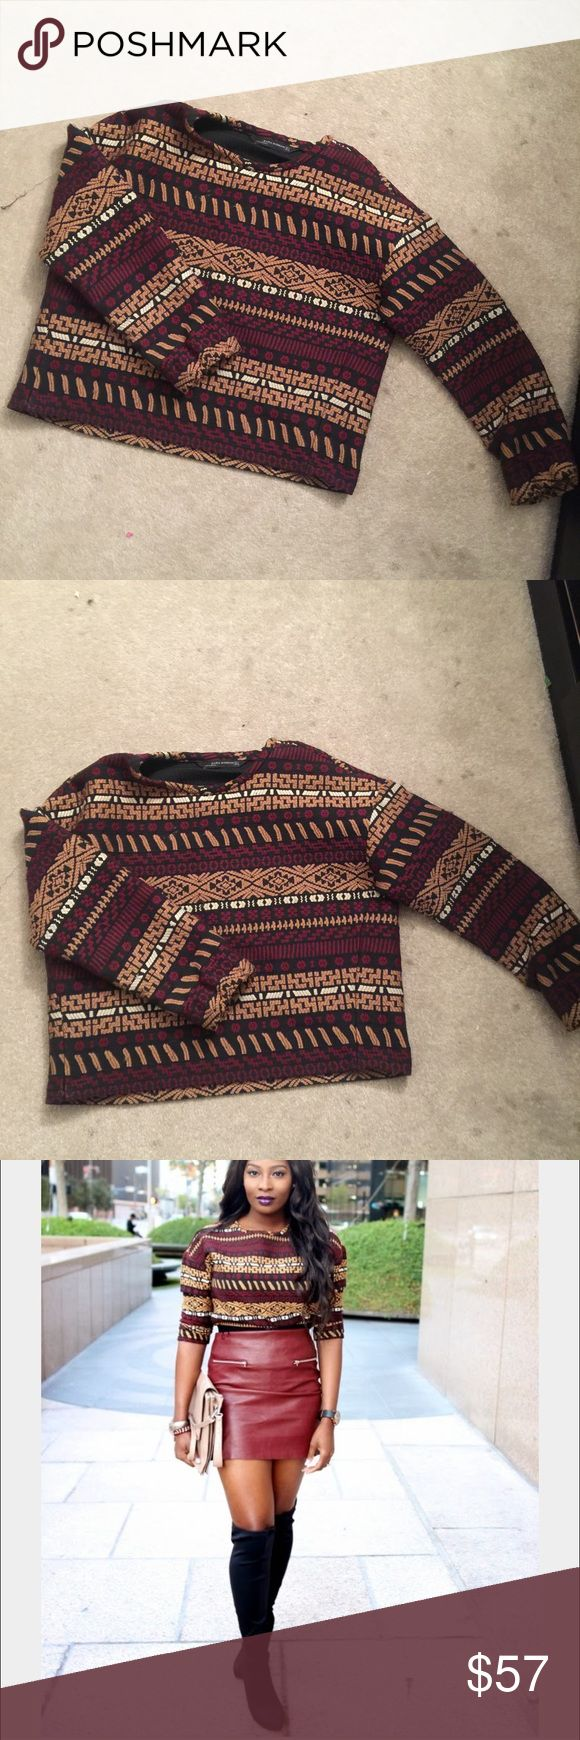 Zara tribal printed sweater Tribal print sweater Zara Sweaters Crew & Scoop Necks